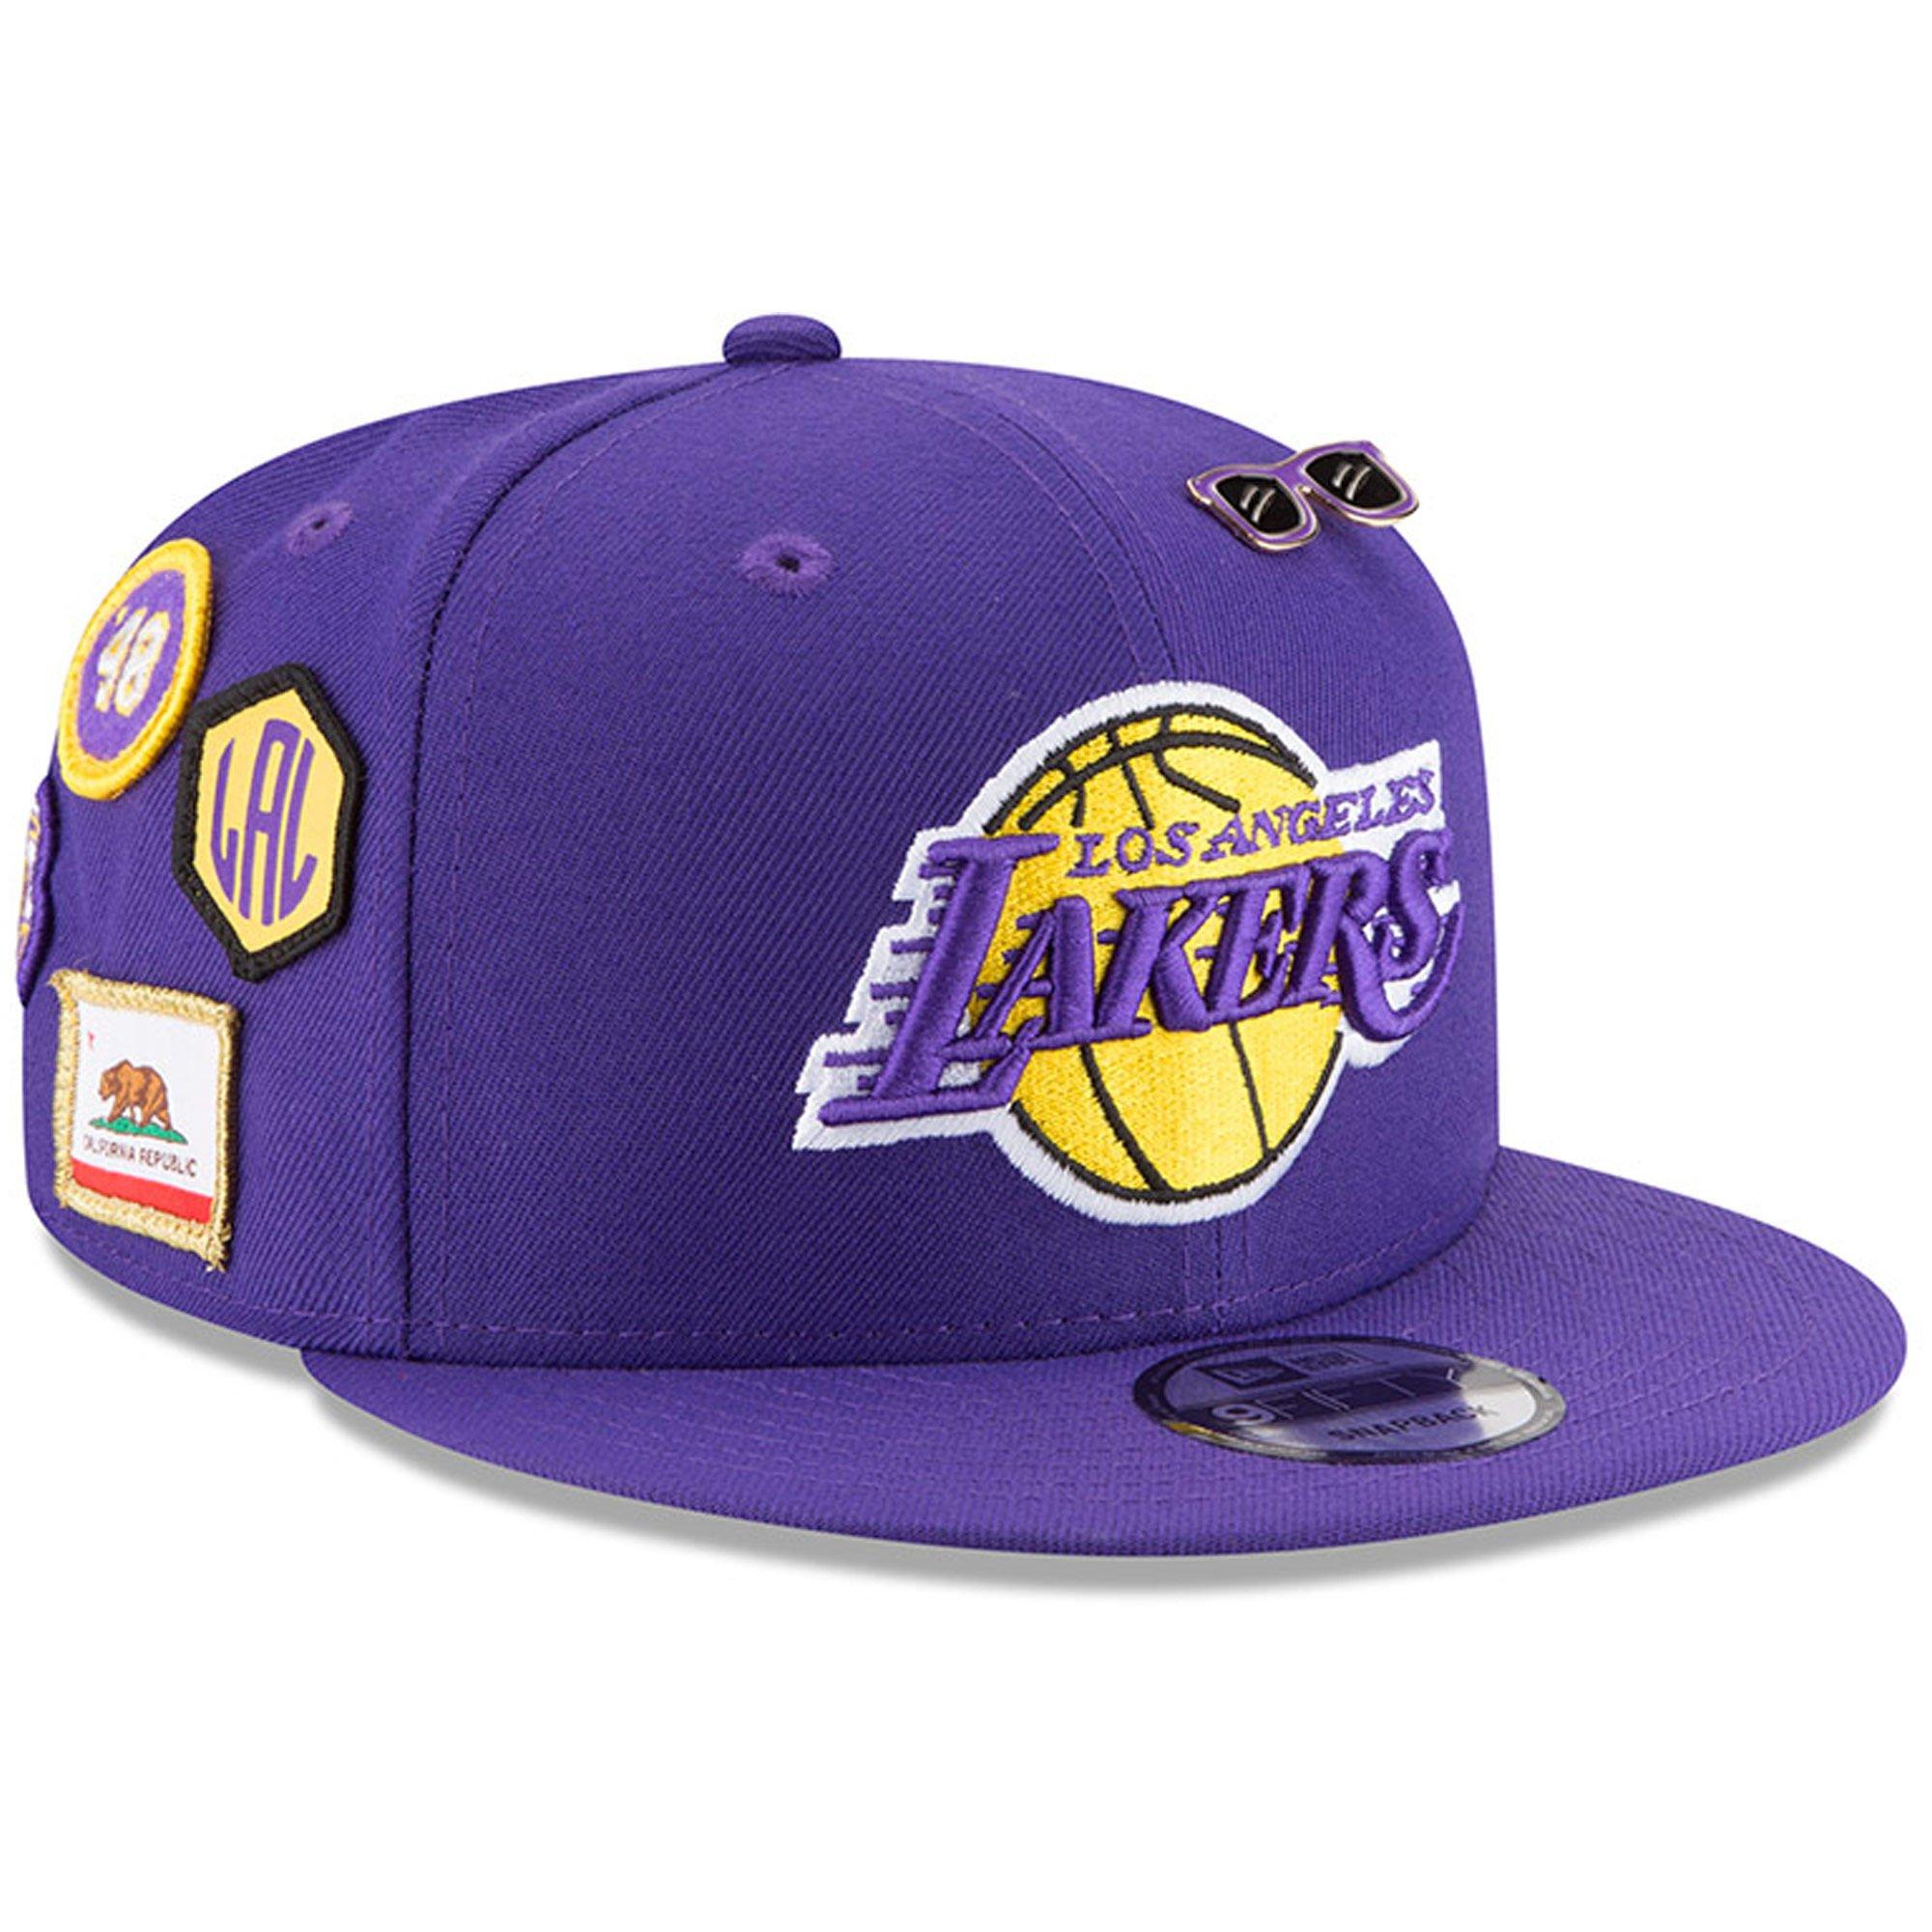 New Era Los Angeles Lakers 2018 NBA Draft Cap 9FIFTY Snapback Adjustable Hat- Purple